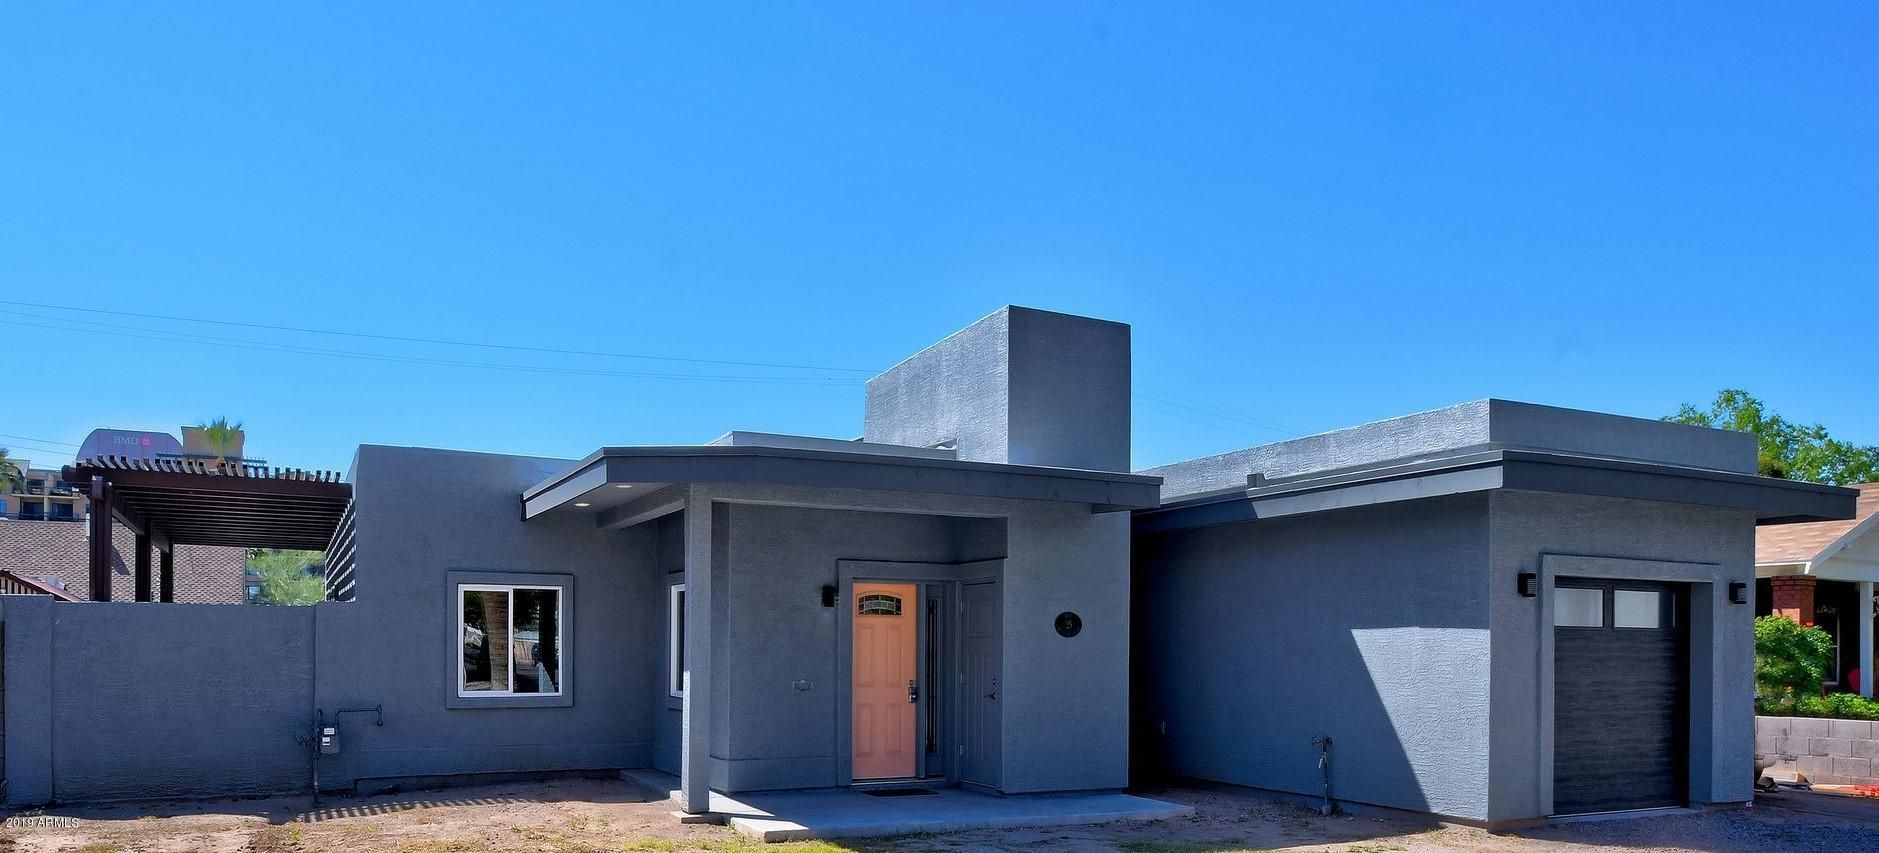 25 W WILSHIRE Drive, Phoenix AZ 85003